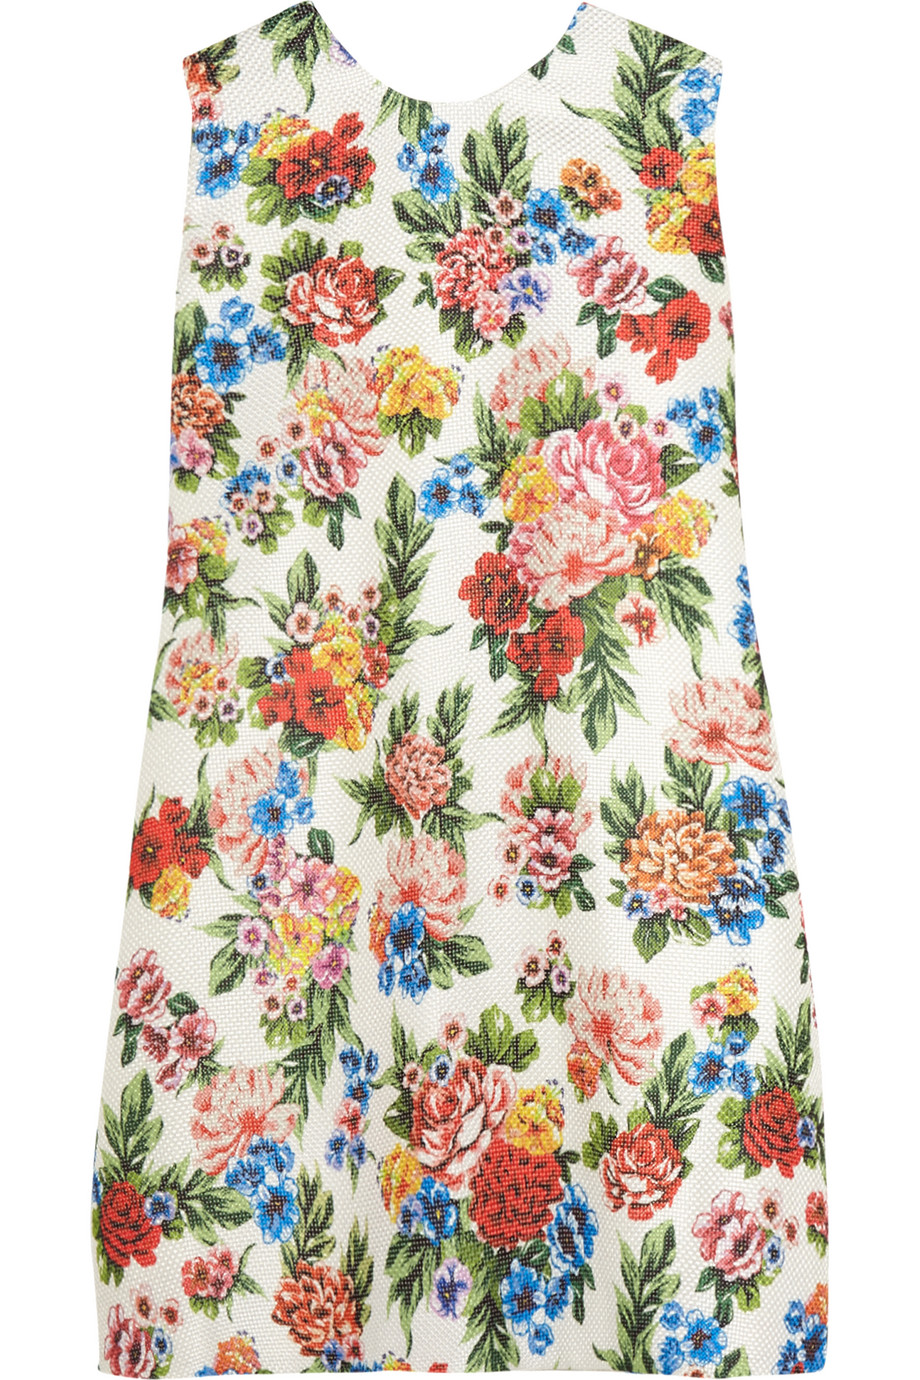 Presley Floral-Print Gazar Mini Dress, Emilia Wickstead, White/Pink, Women's, Size: 10